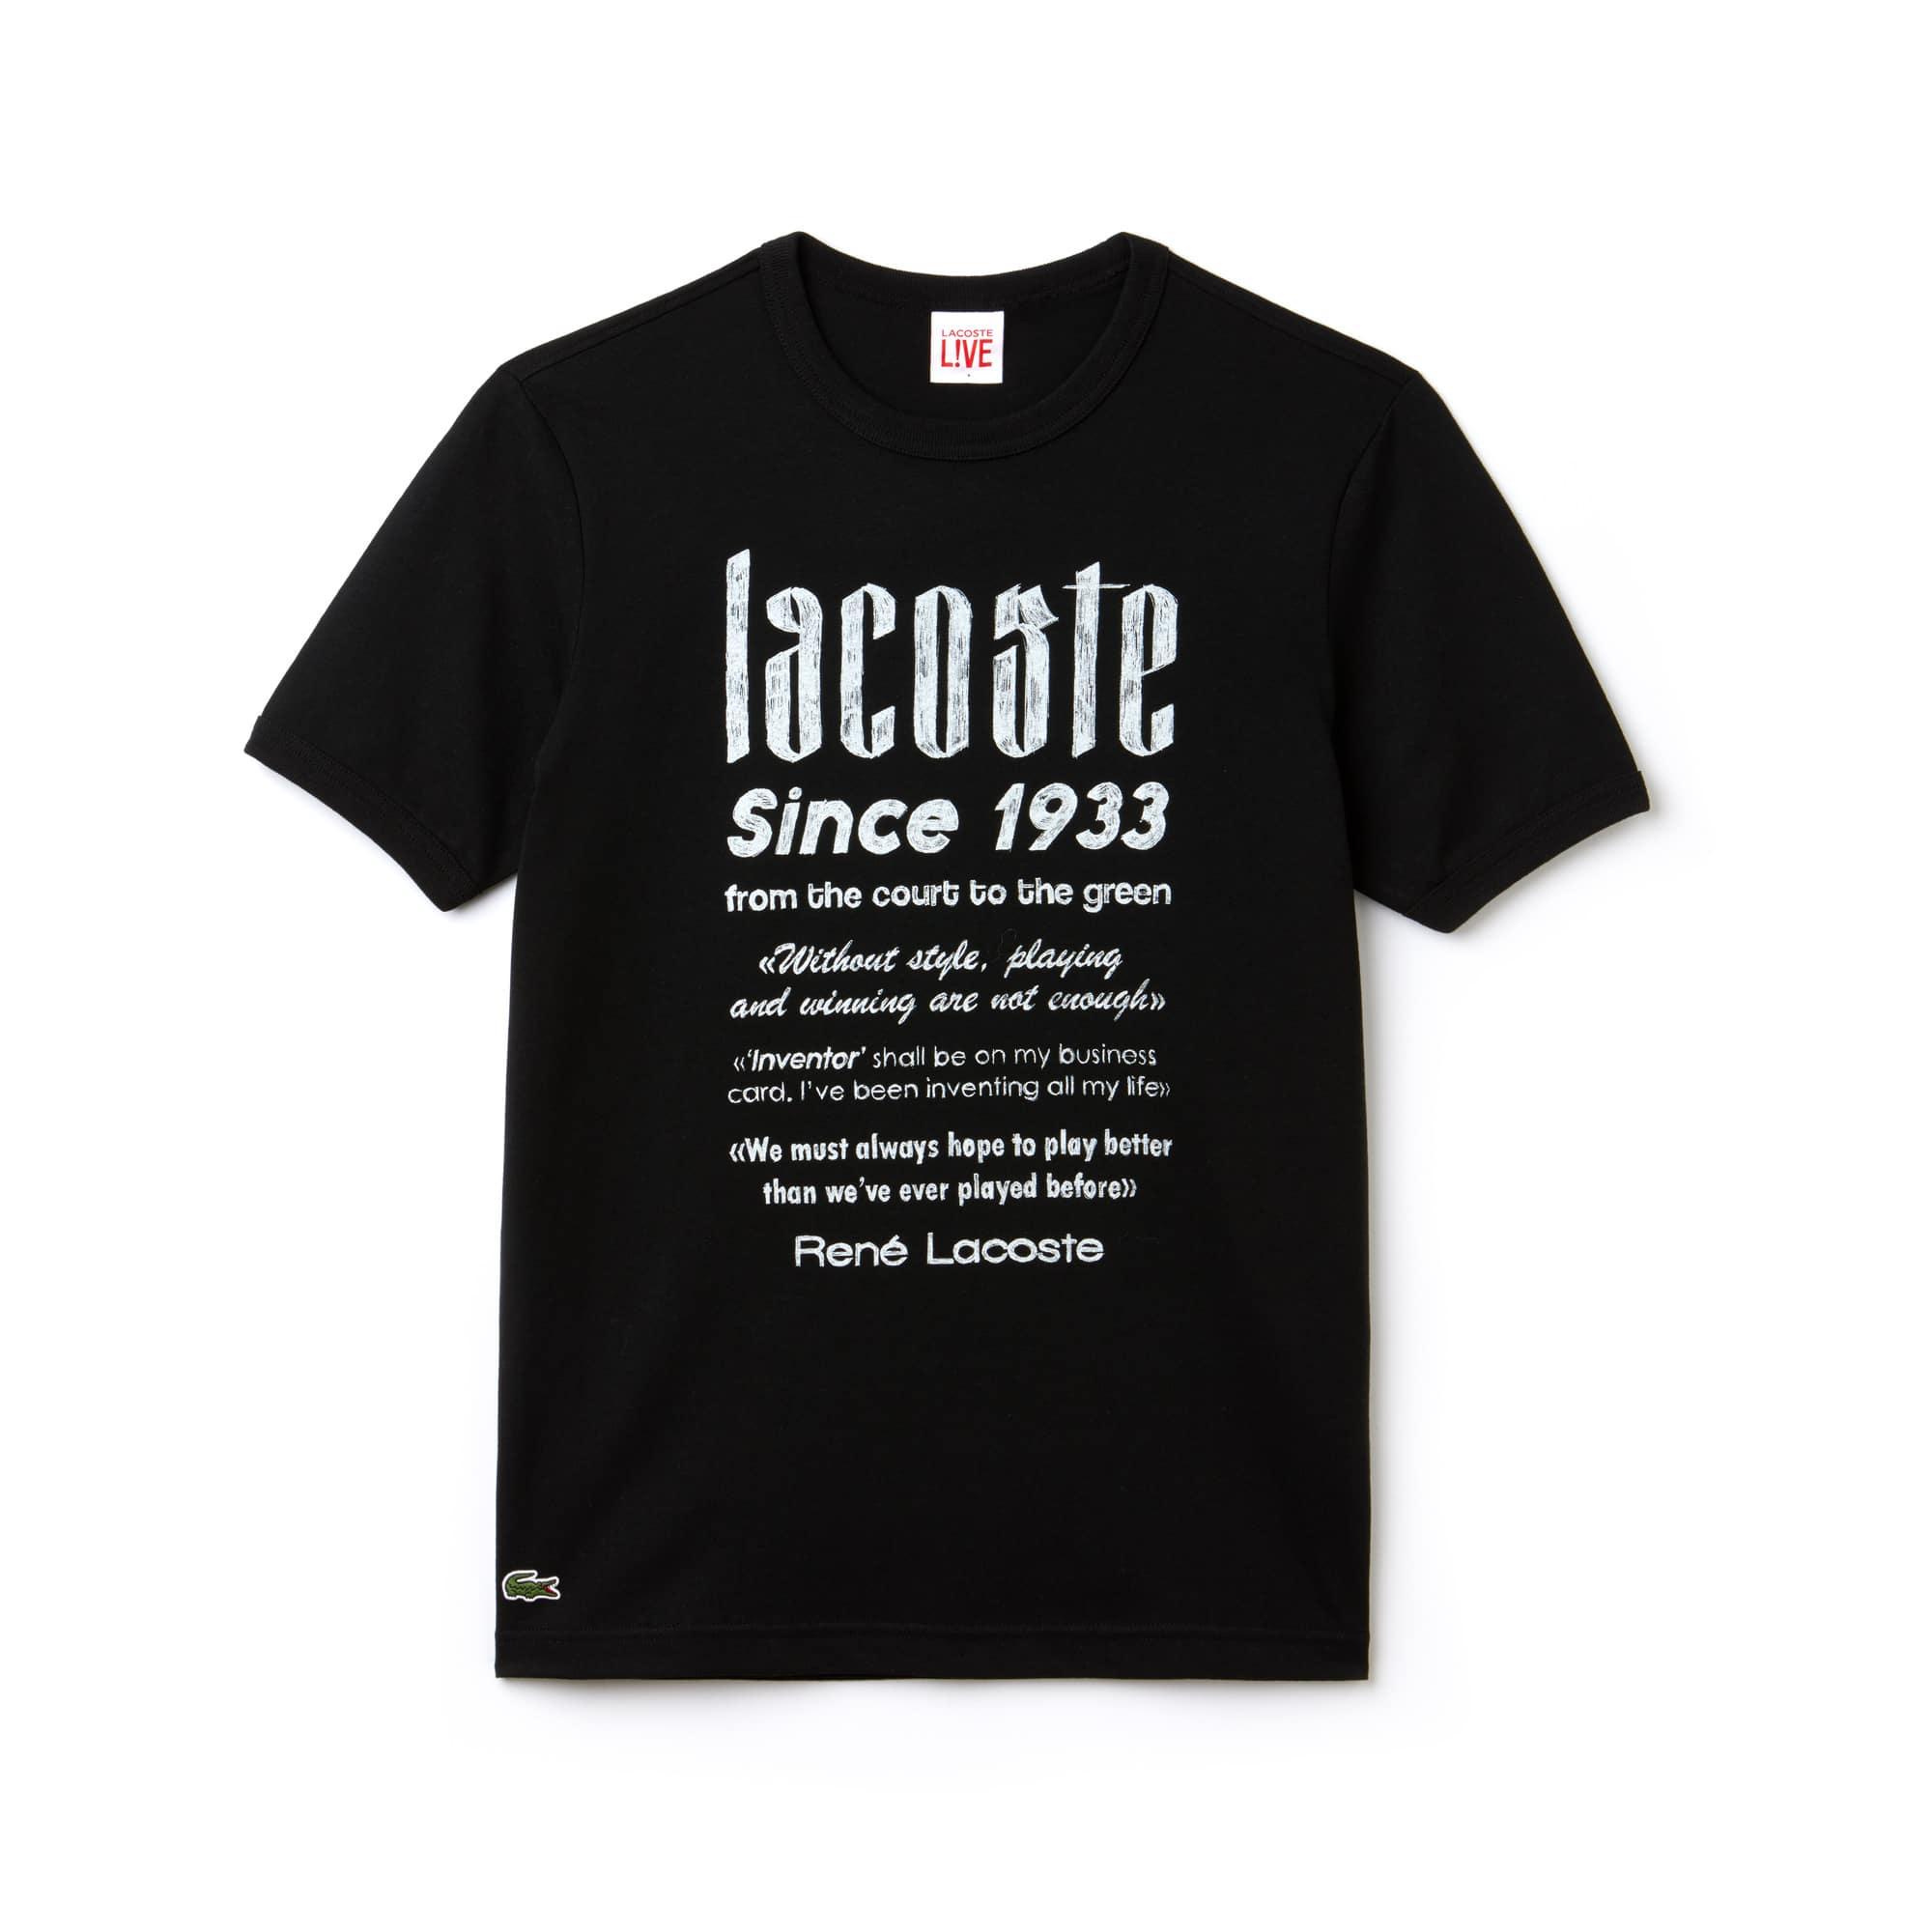 Lacoste LIVE男士圆领设计印花棉质T恤